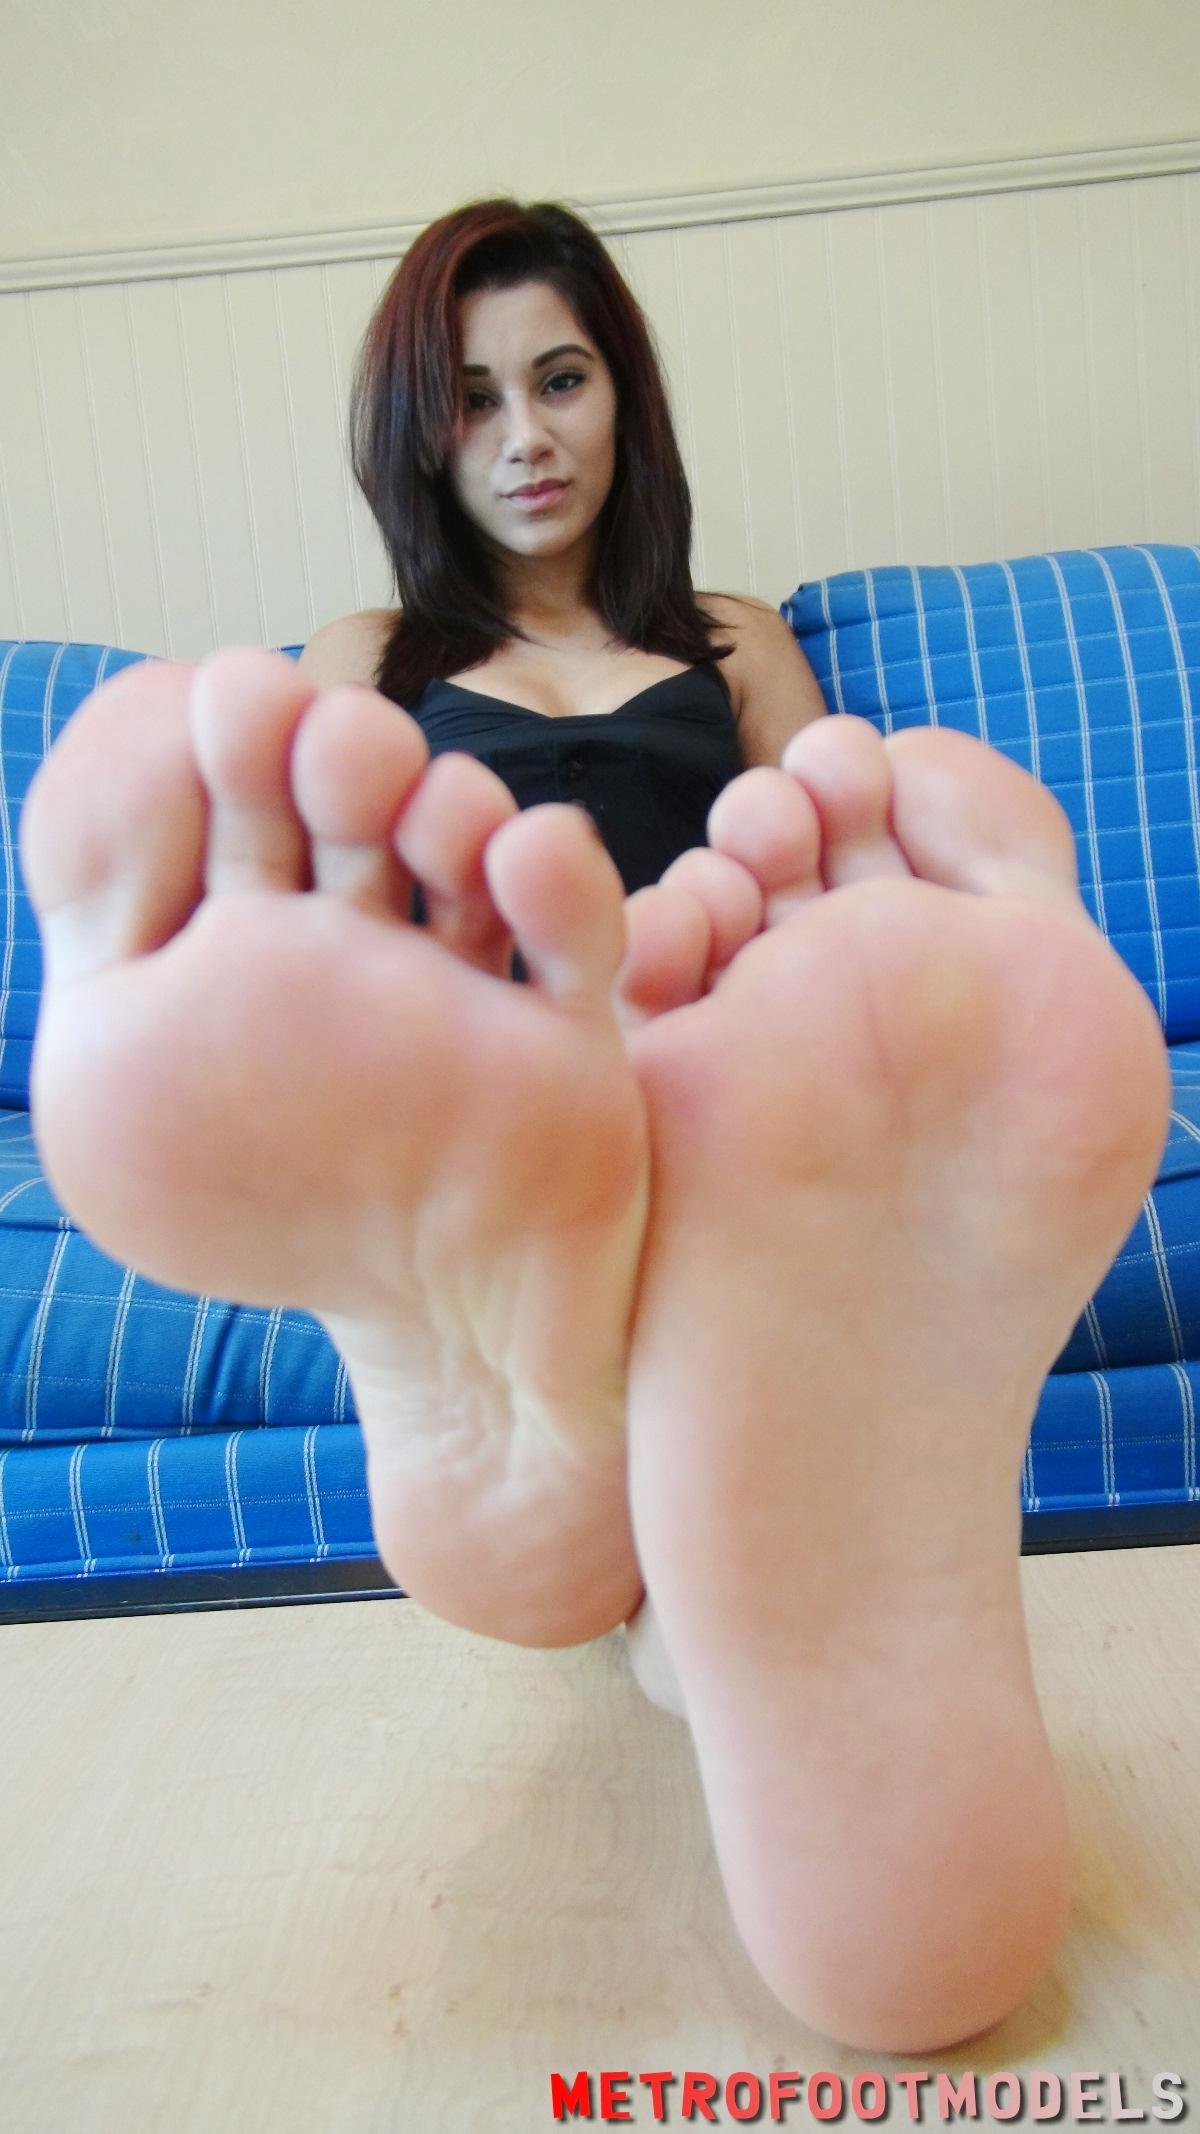 Sexy foot models